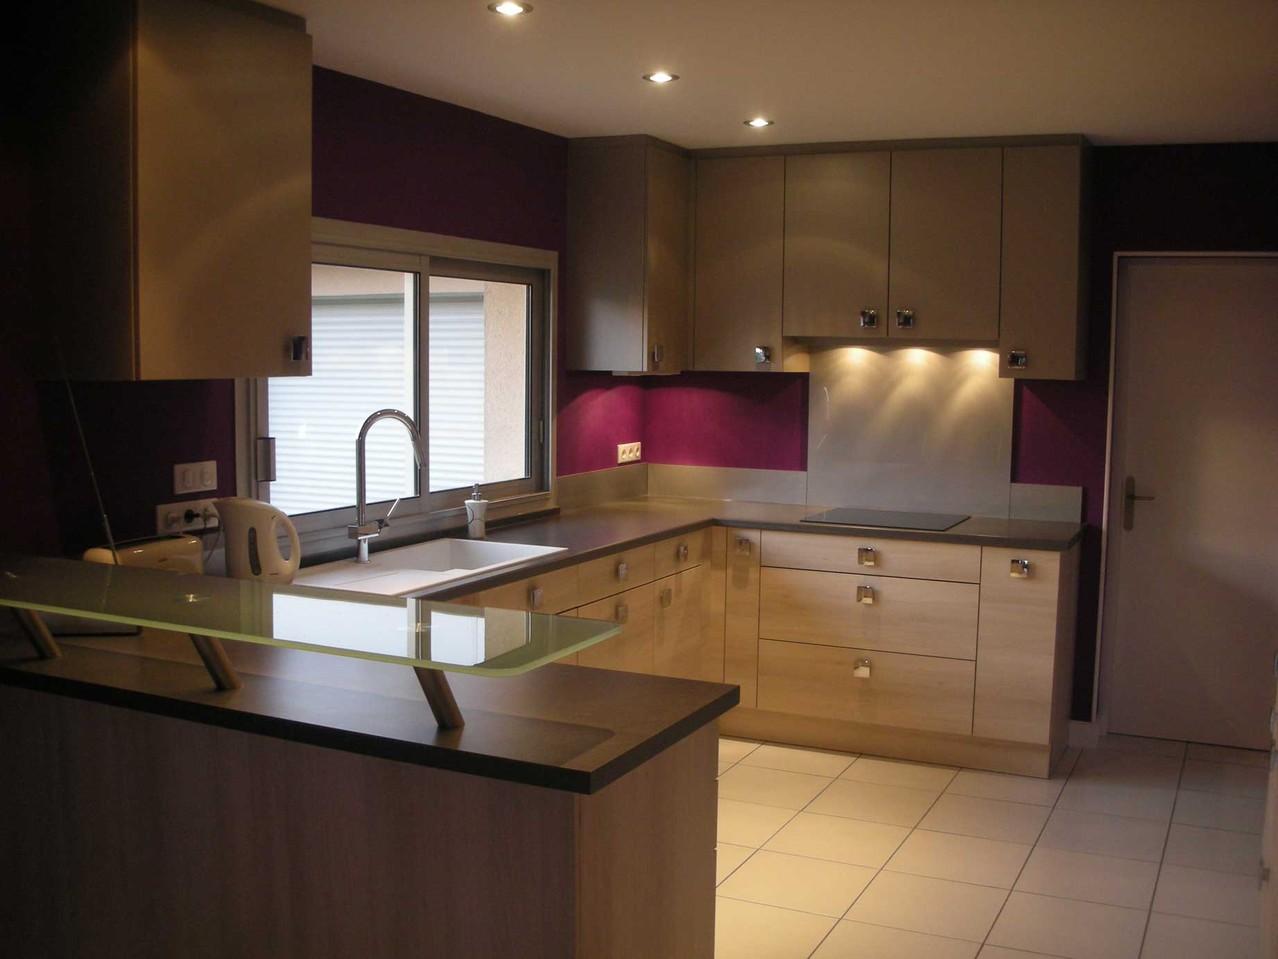 plomberie cuisine lampe suspendue cuisine u globetravel en ce qui concerne luminaire cuisine. Black Bedroom Furniture Sets. Home Design Ideas